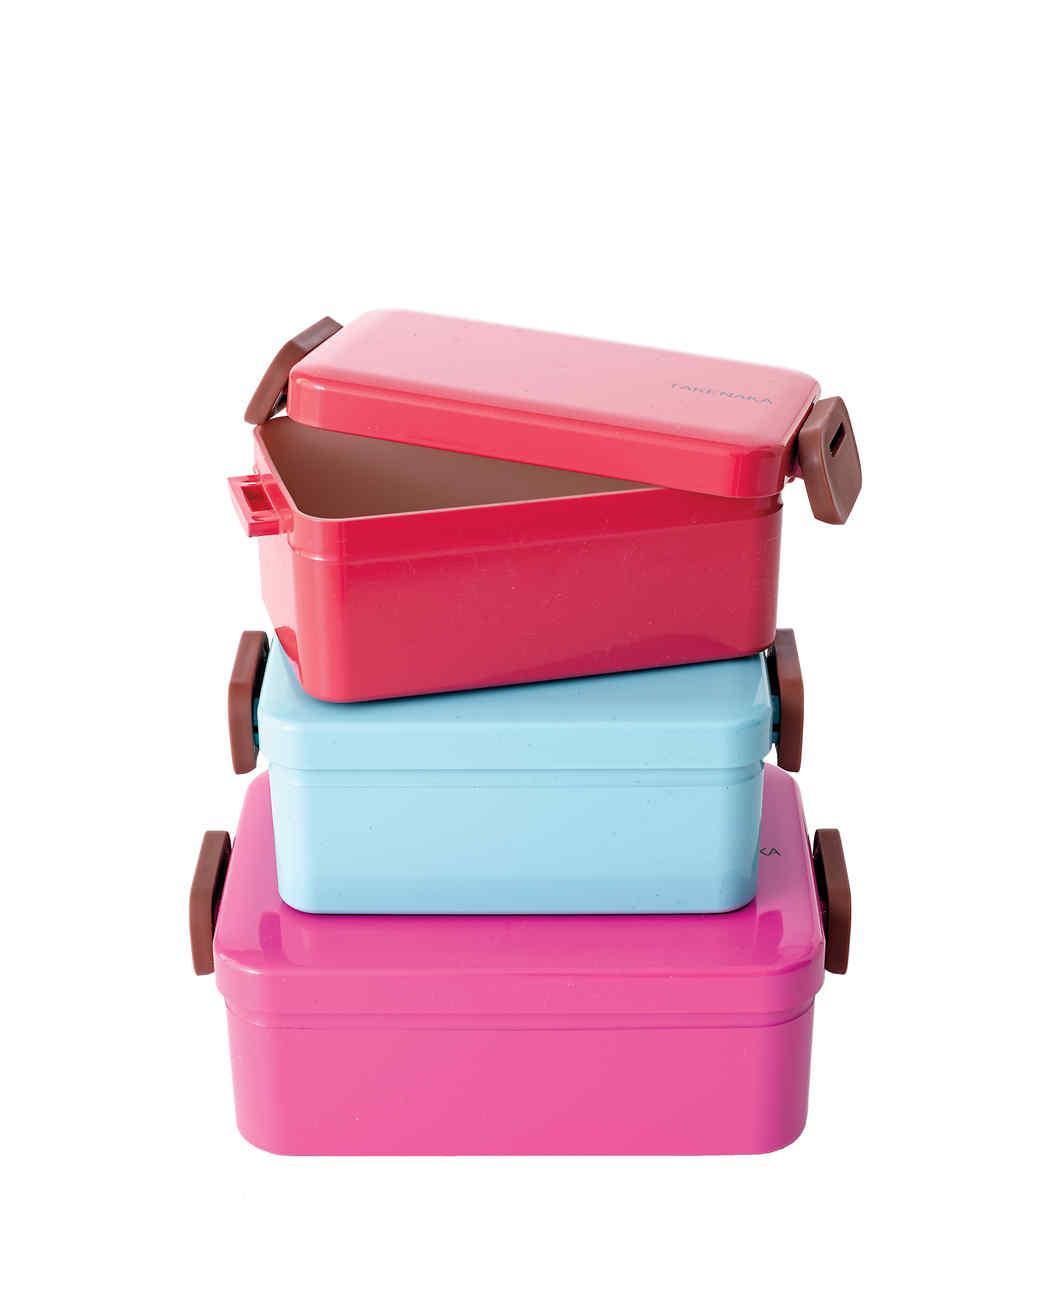 plastic-lunchbox-md110877.jpg